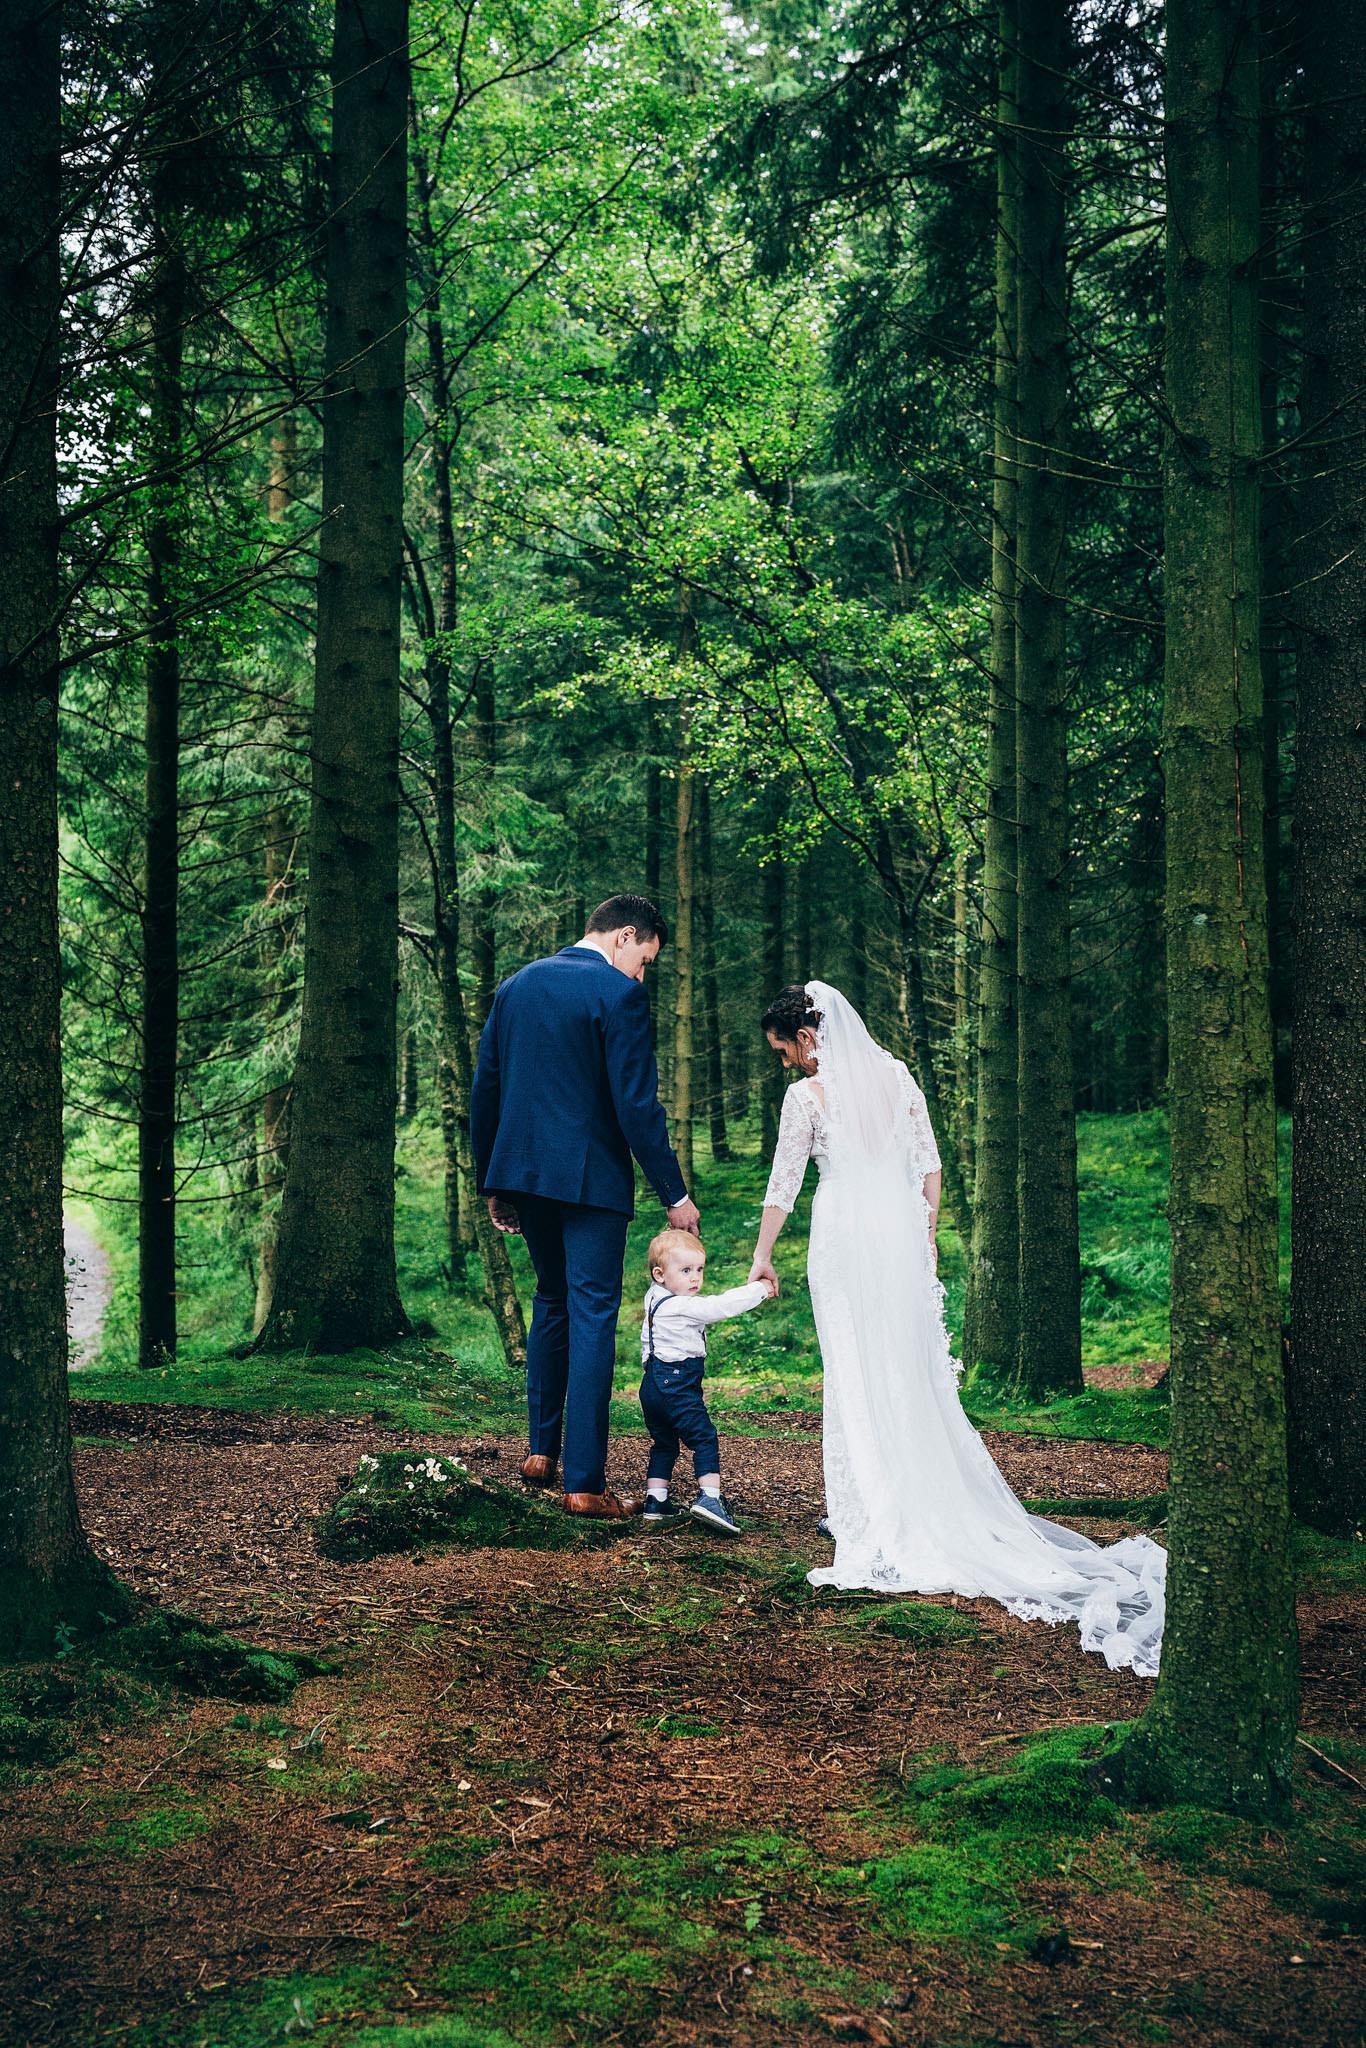 Norway+wedding+photographer+elopement+pre+wedding+Casey+Arneson-54.jpg